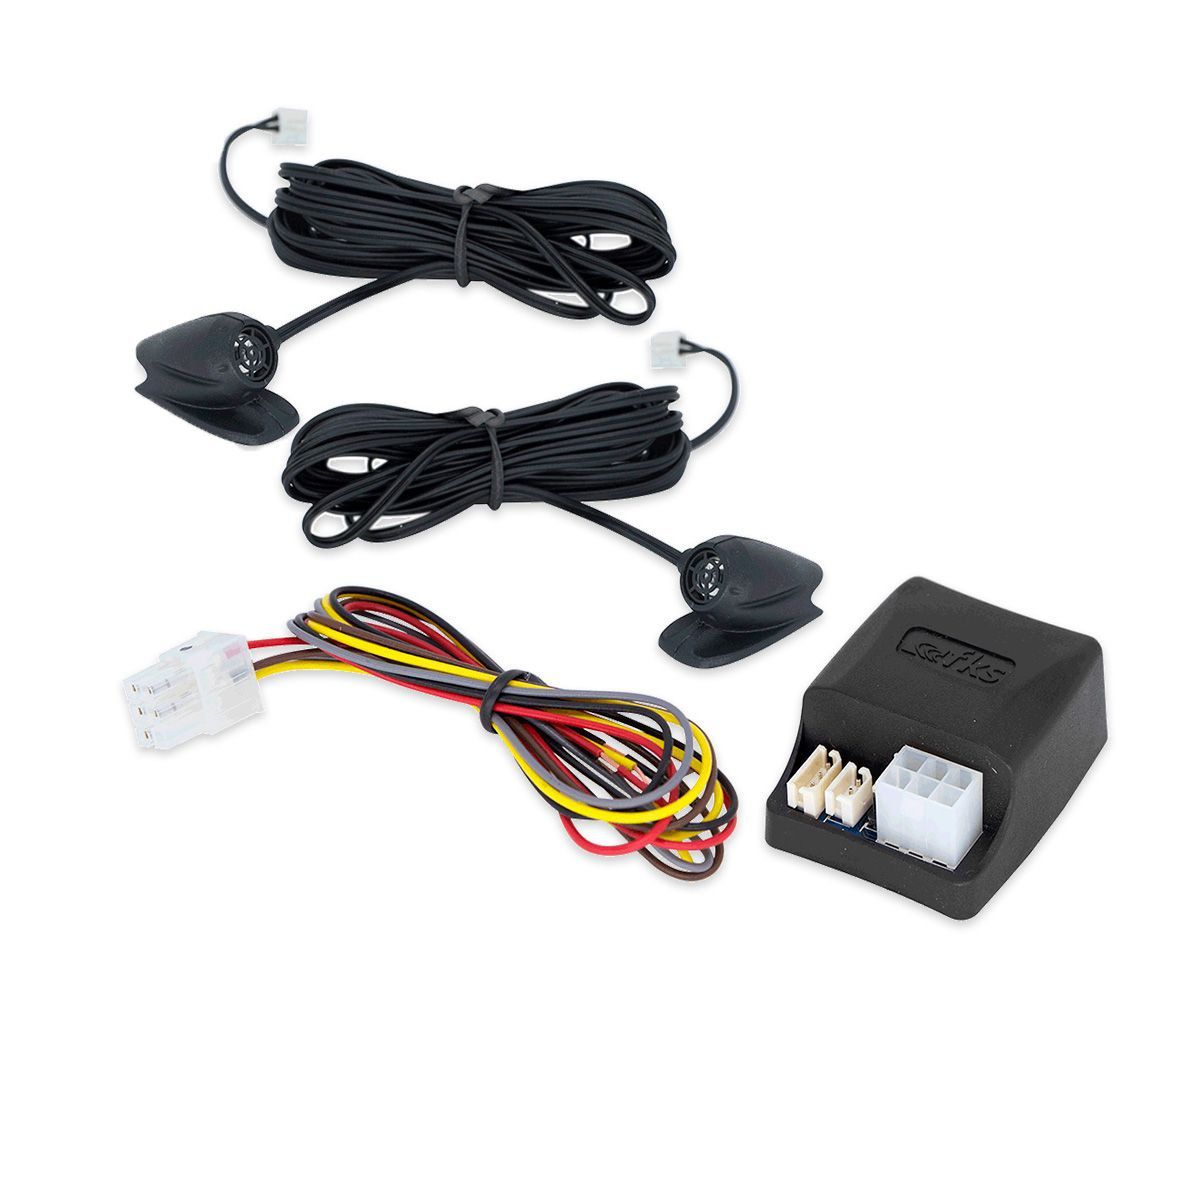 Módulo Sensor Ultrasom Automotivo Universal Sus200 SN FKS